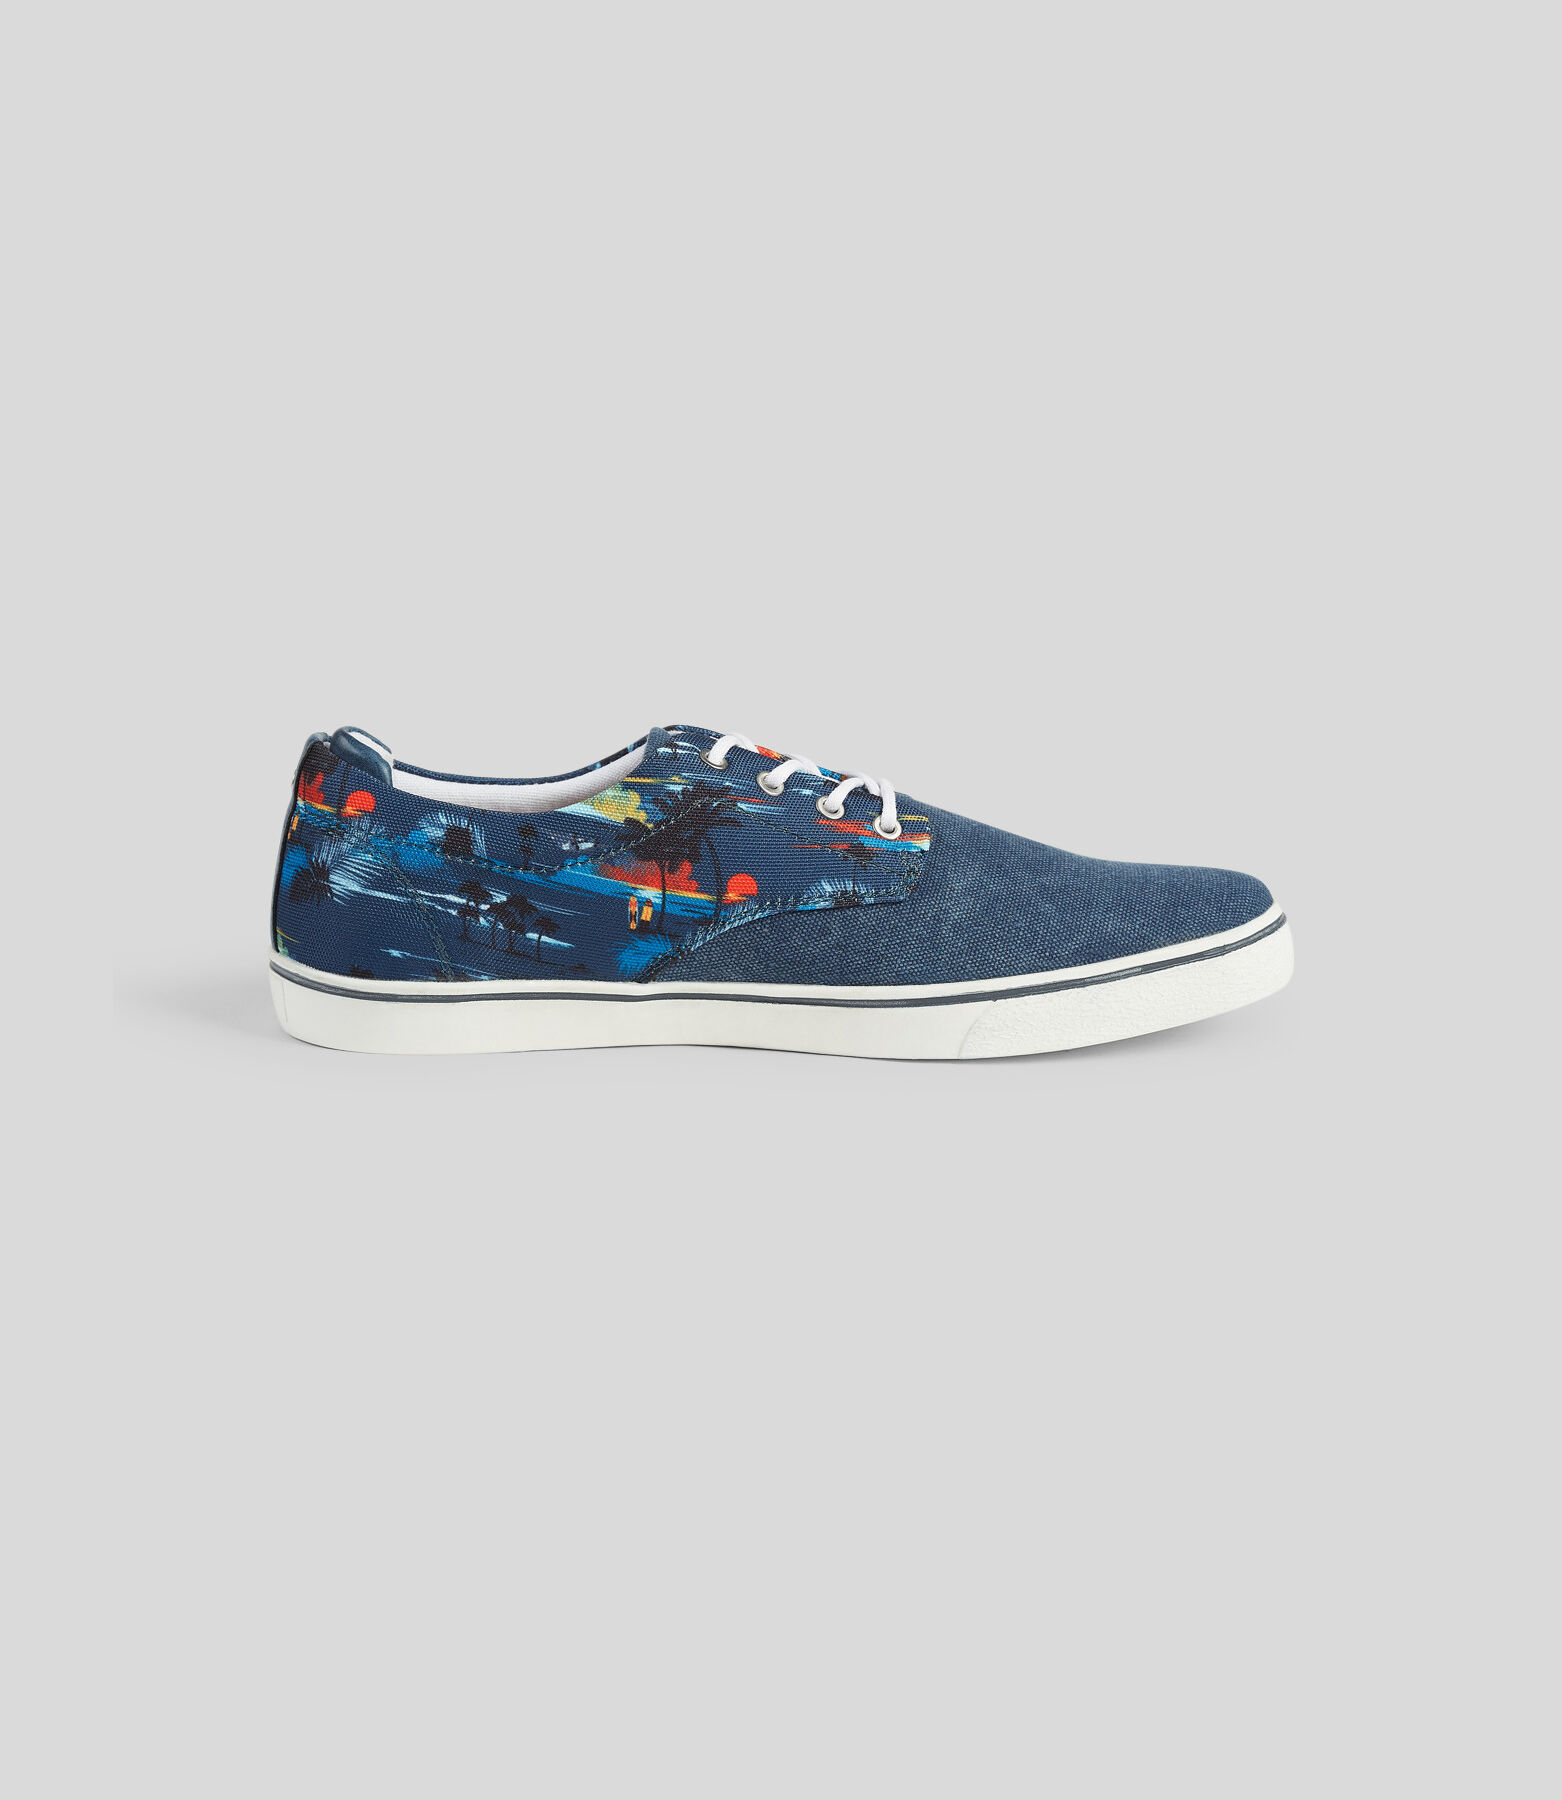 Chaussures Bleu Fantaisie